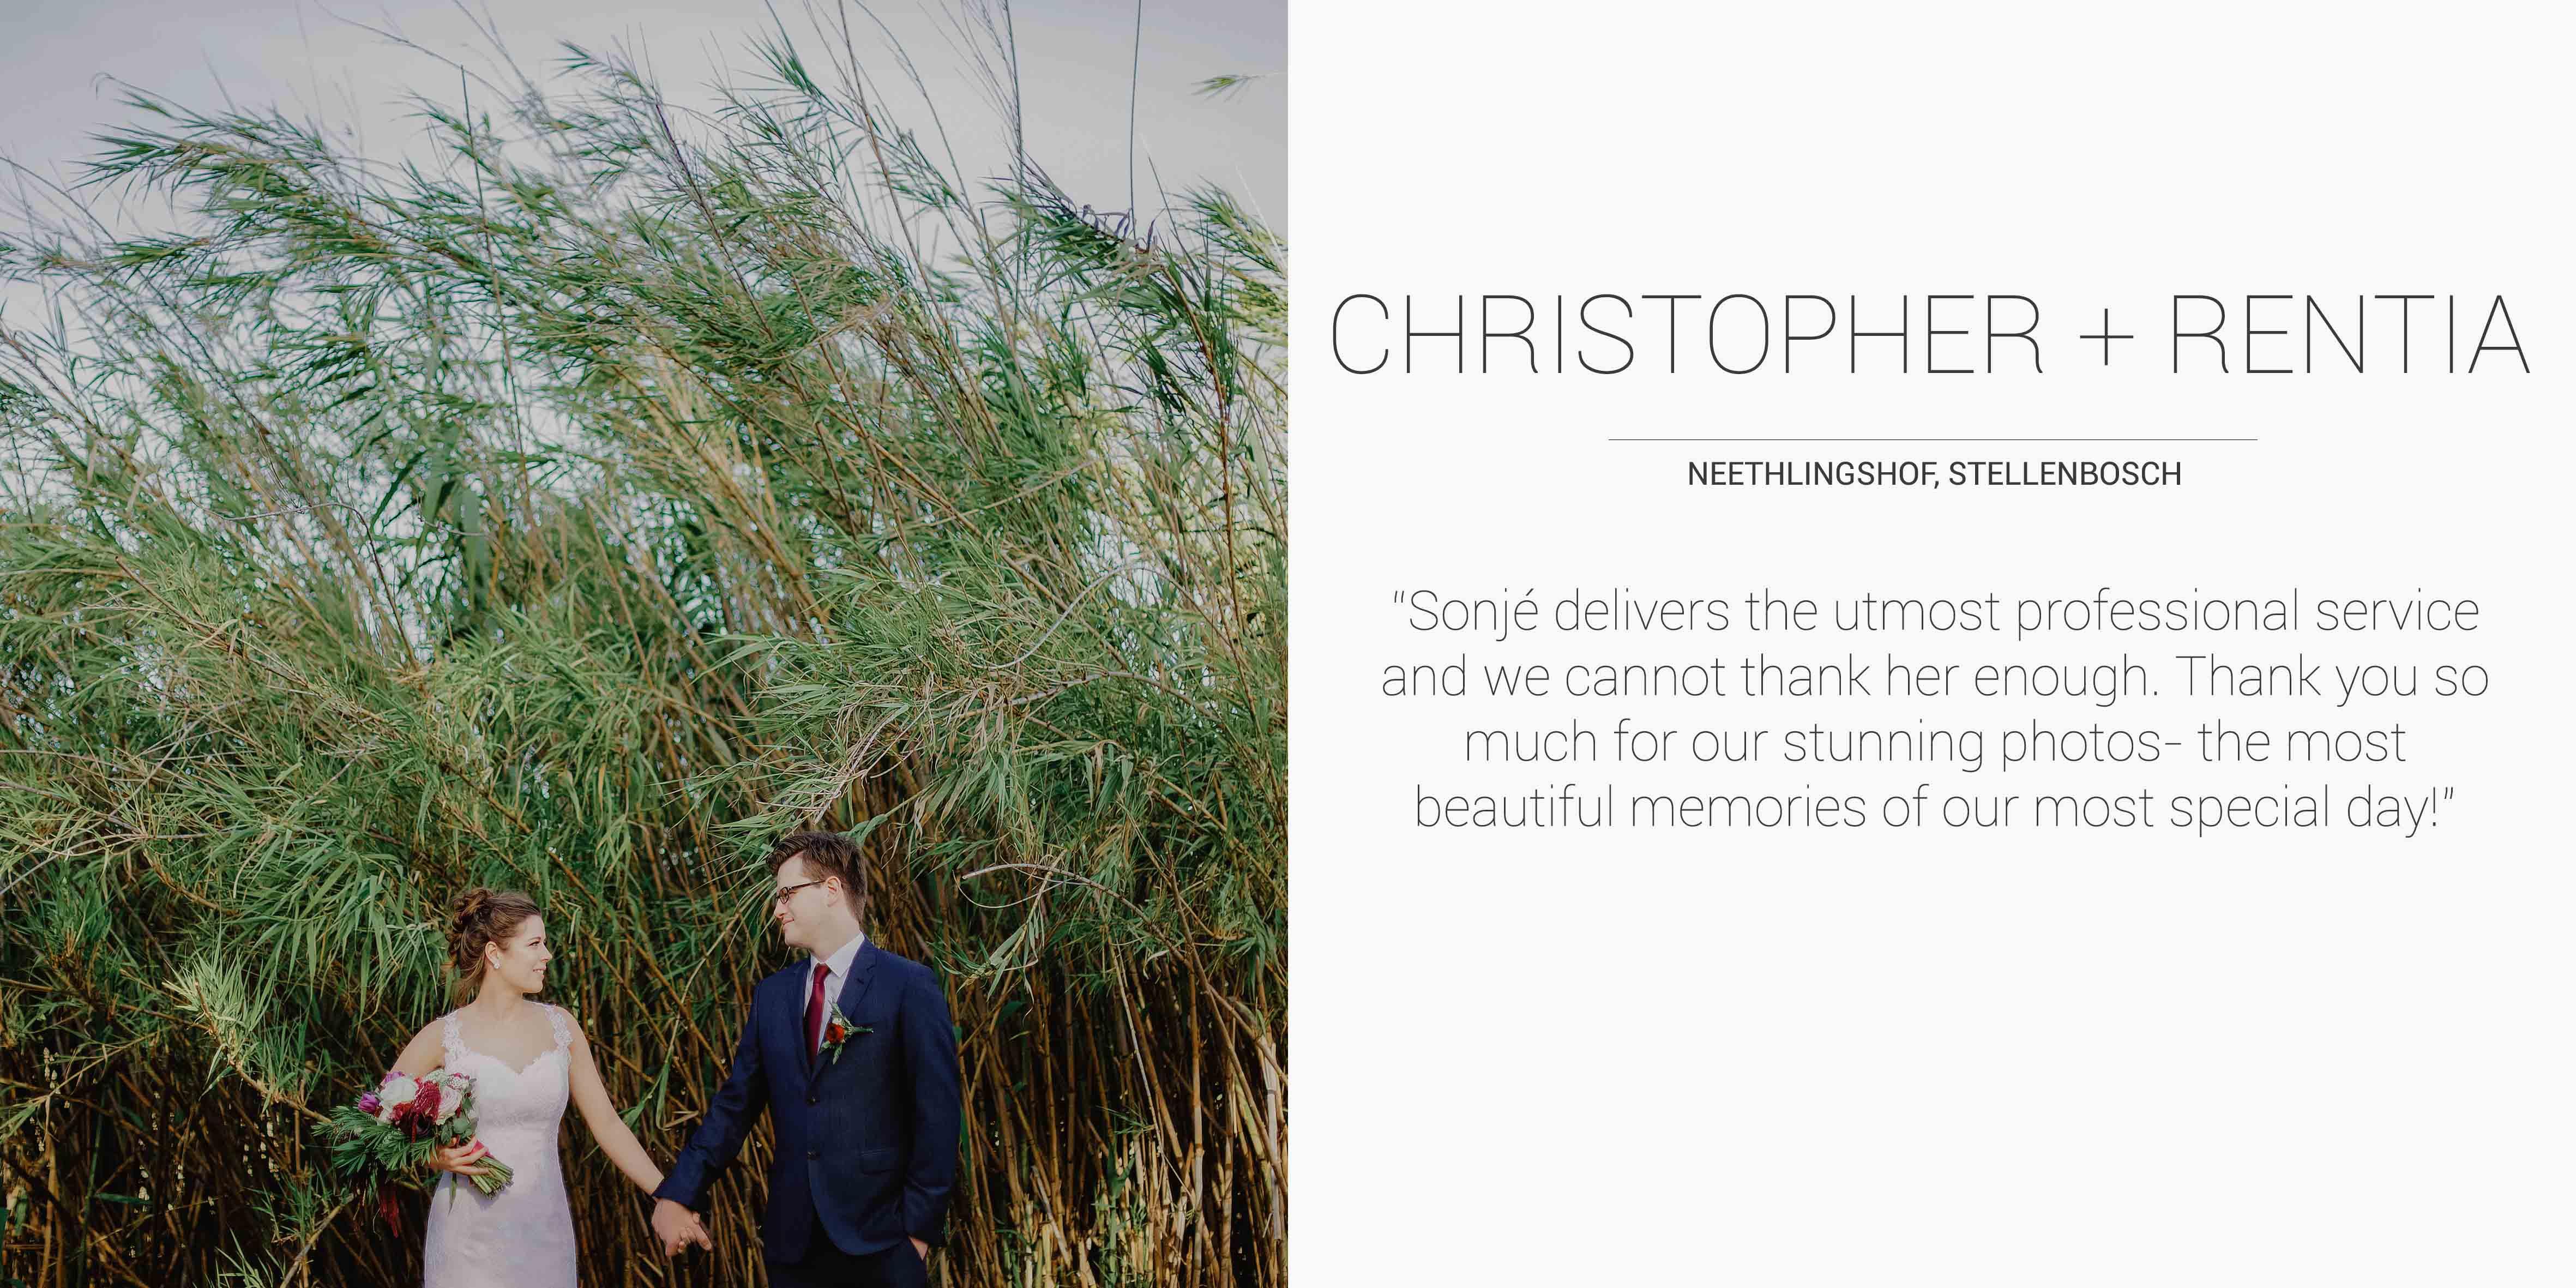 Christopher + Rentia Desktop Testimonial